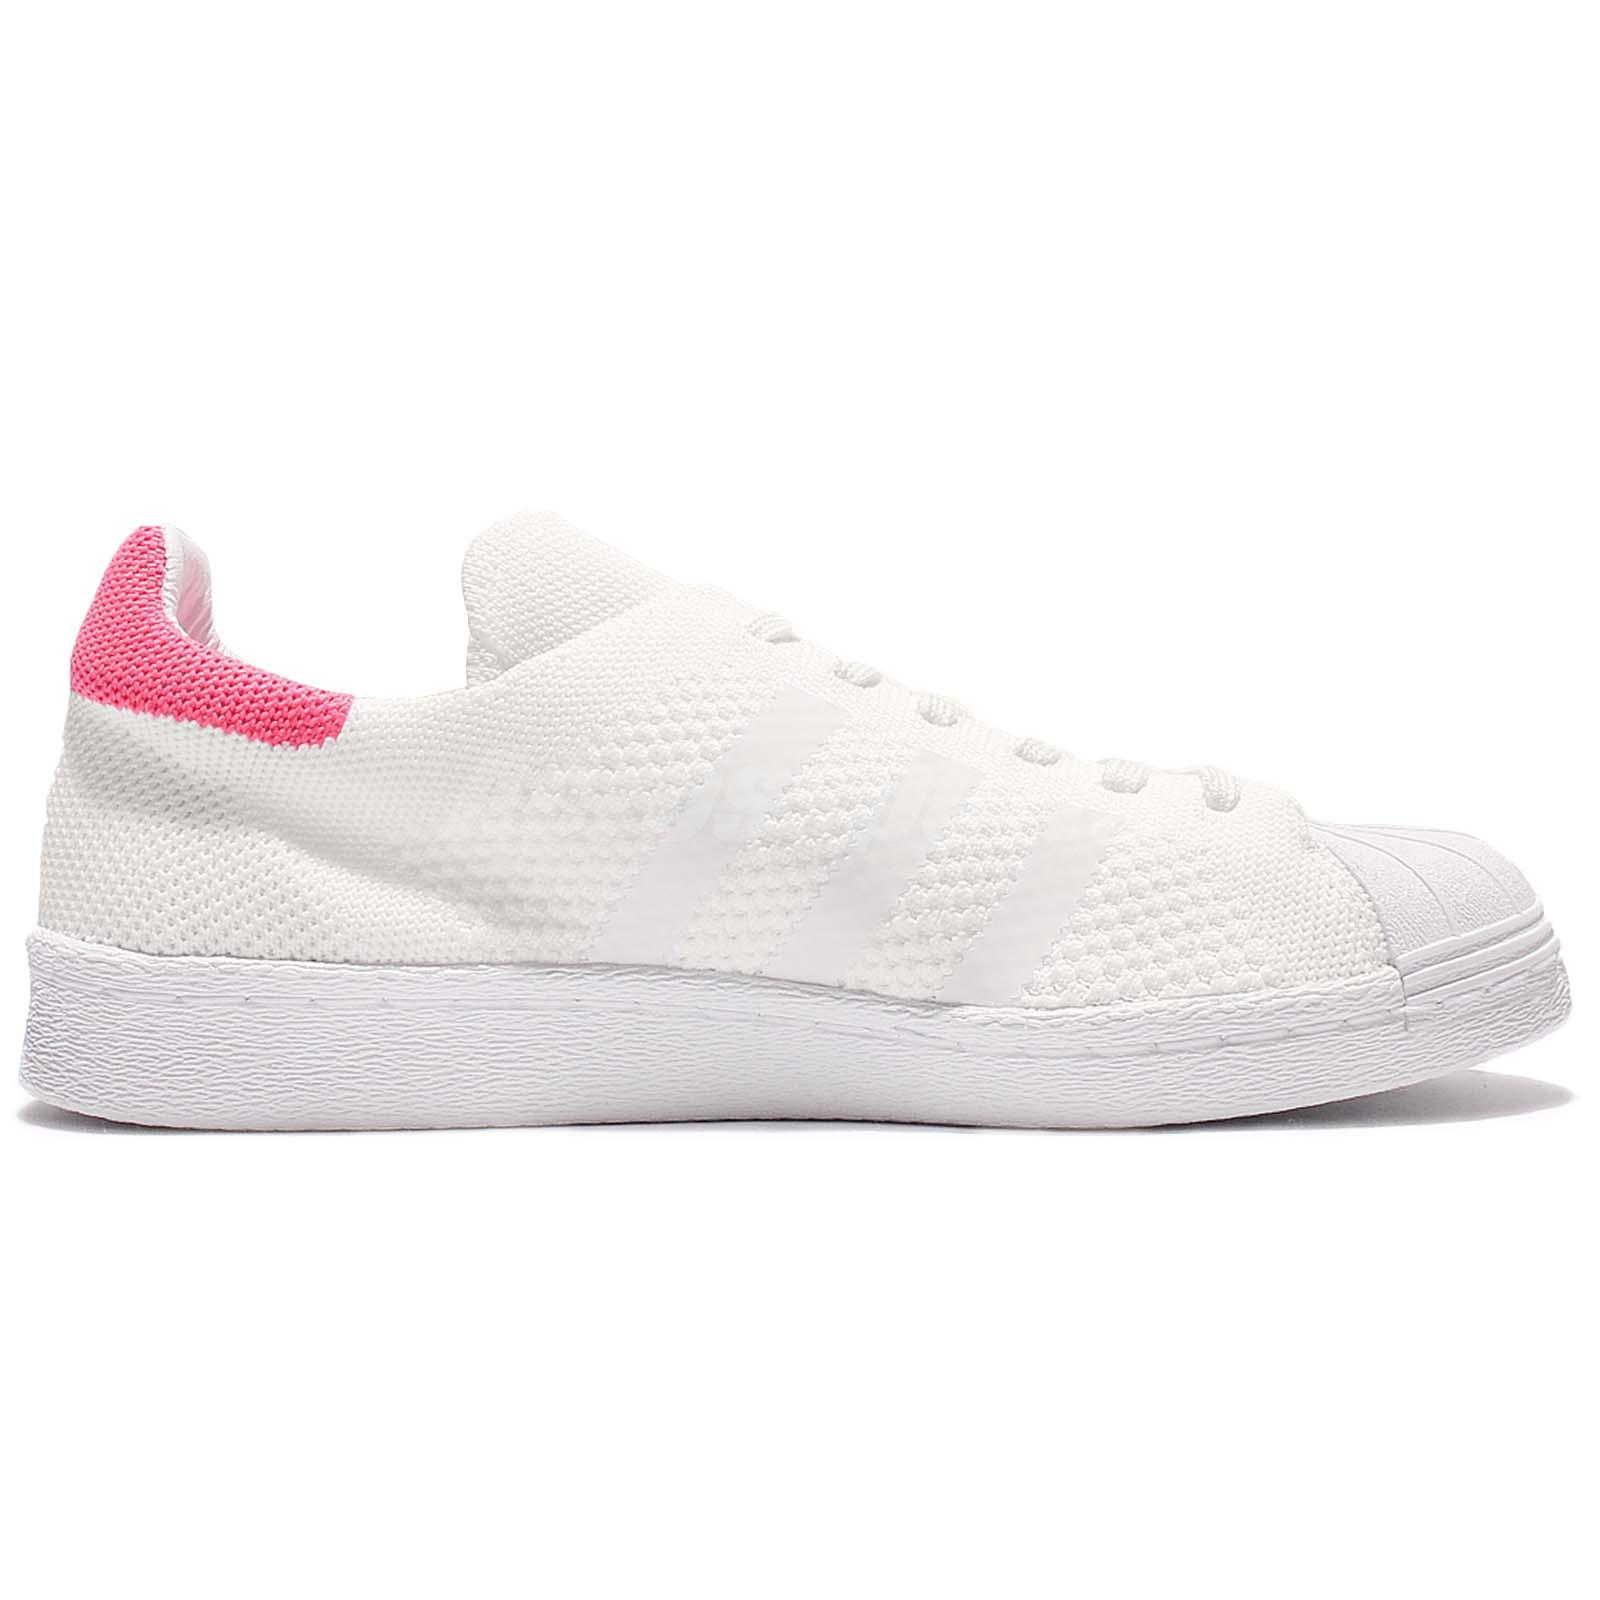 ca3edd60c62e Buy adidas superstar 80s primeknit women Pink   OFF64% Discounted